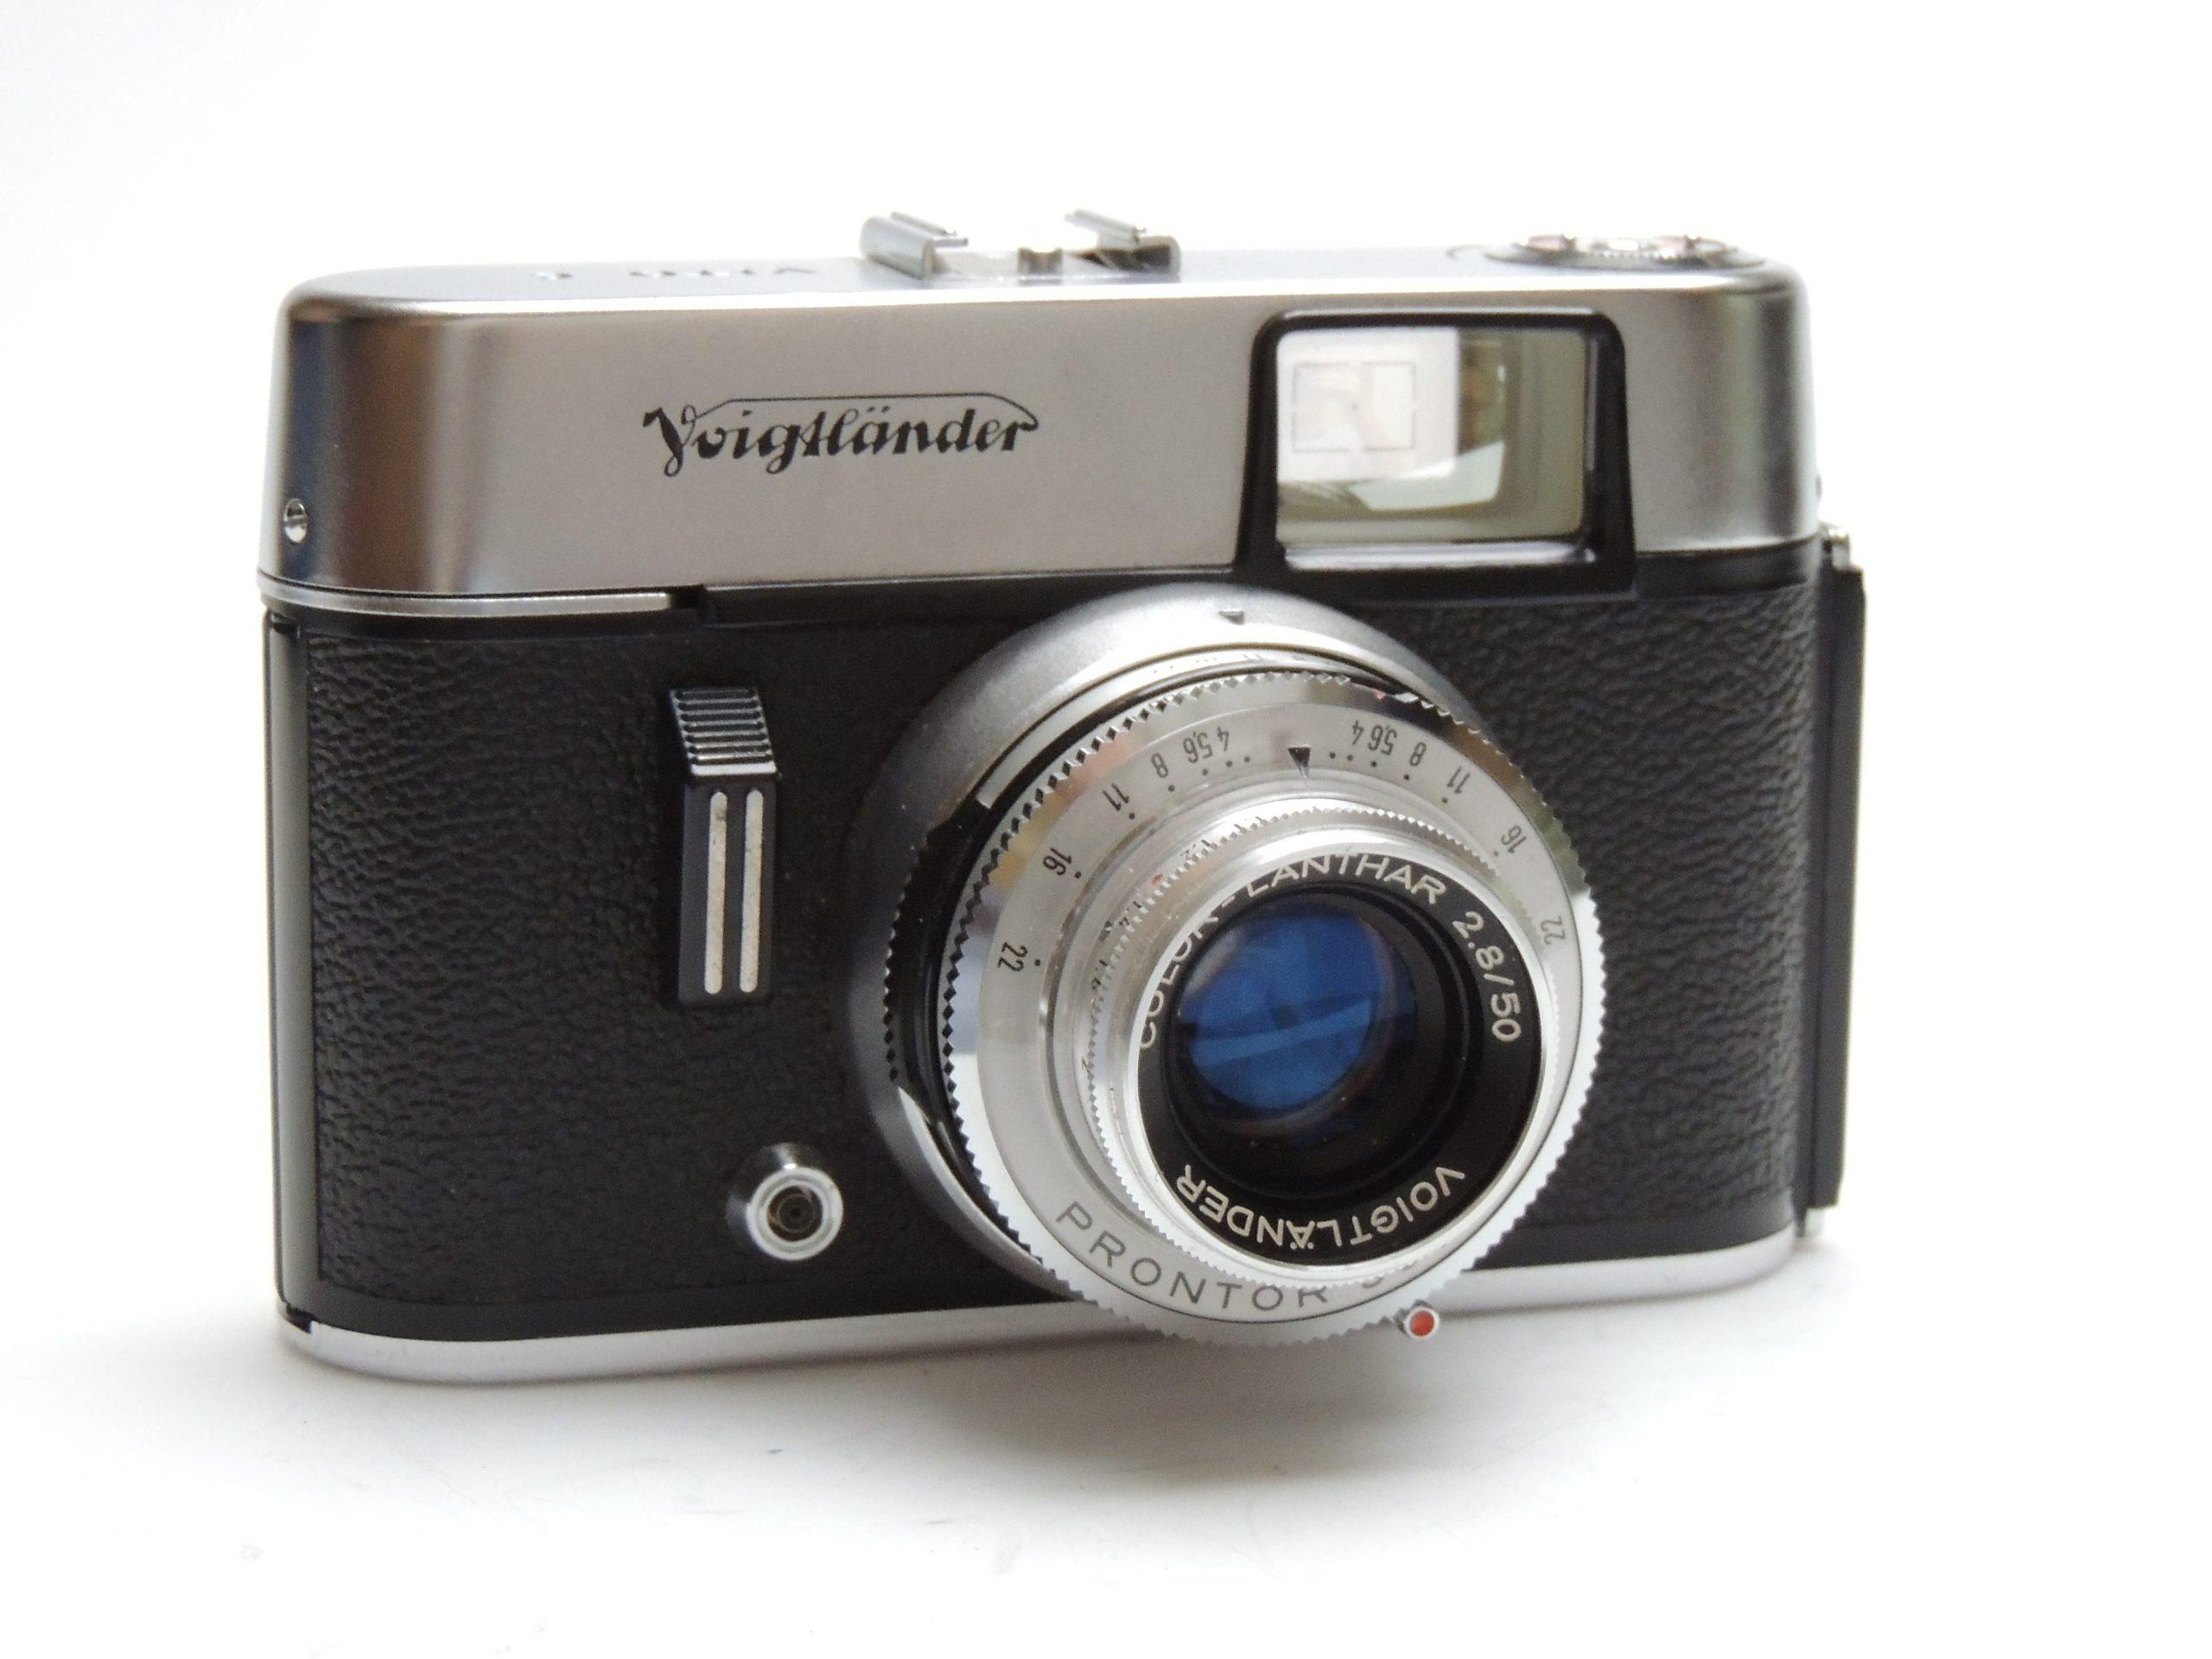 Voigtlander-Vito-C-Camera-50mm-f2.8-Colour-Lanthar-46--scaled.jpg